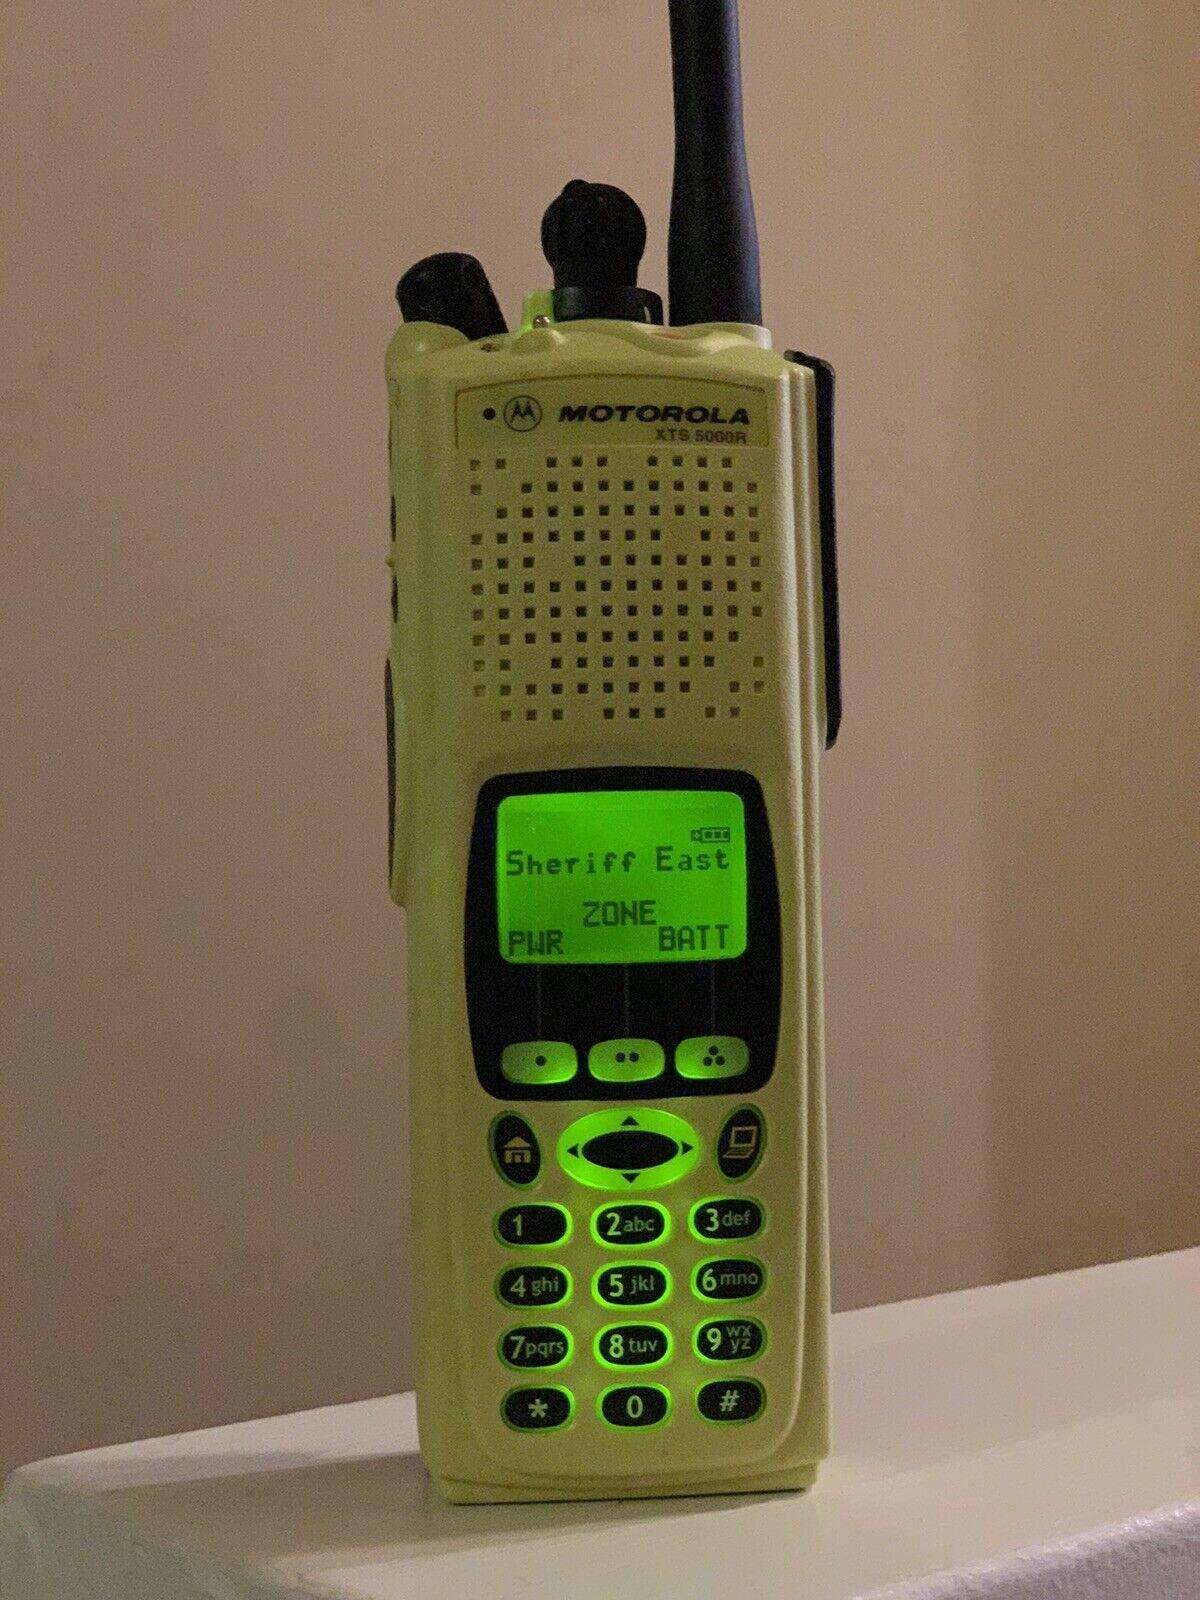 Motorola XTS5000. Buy it now for 600.00